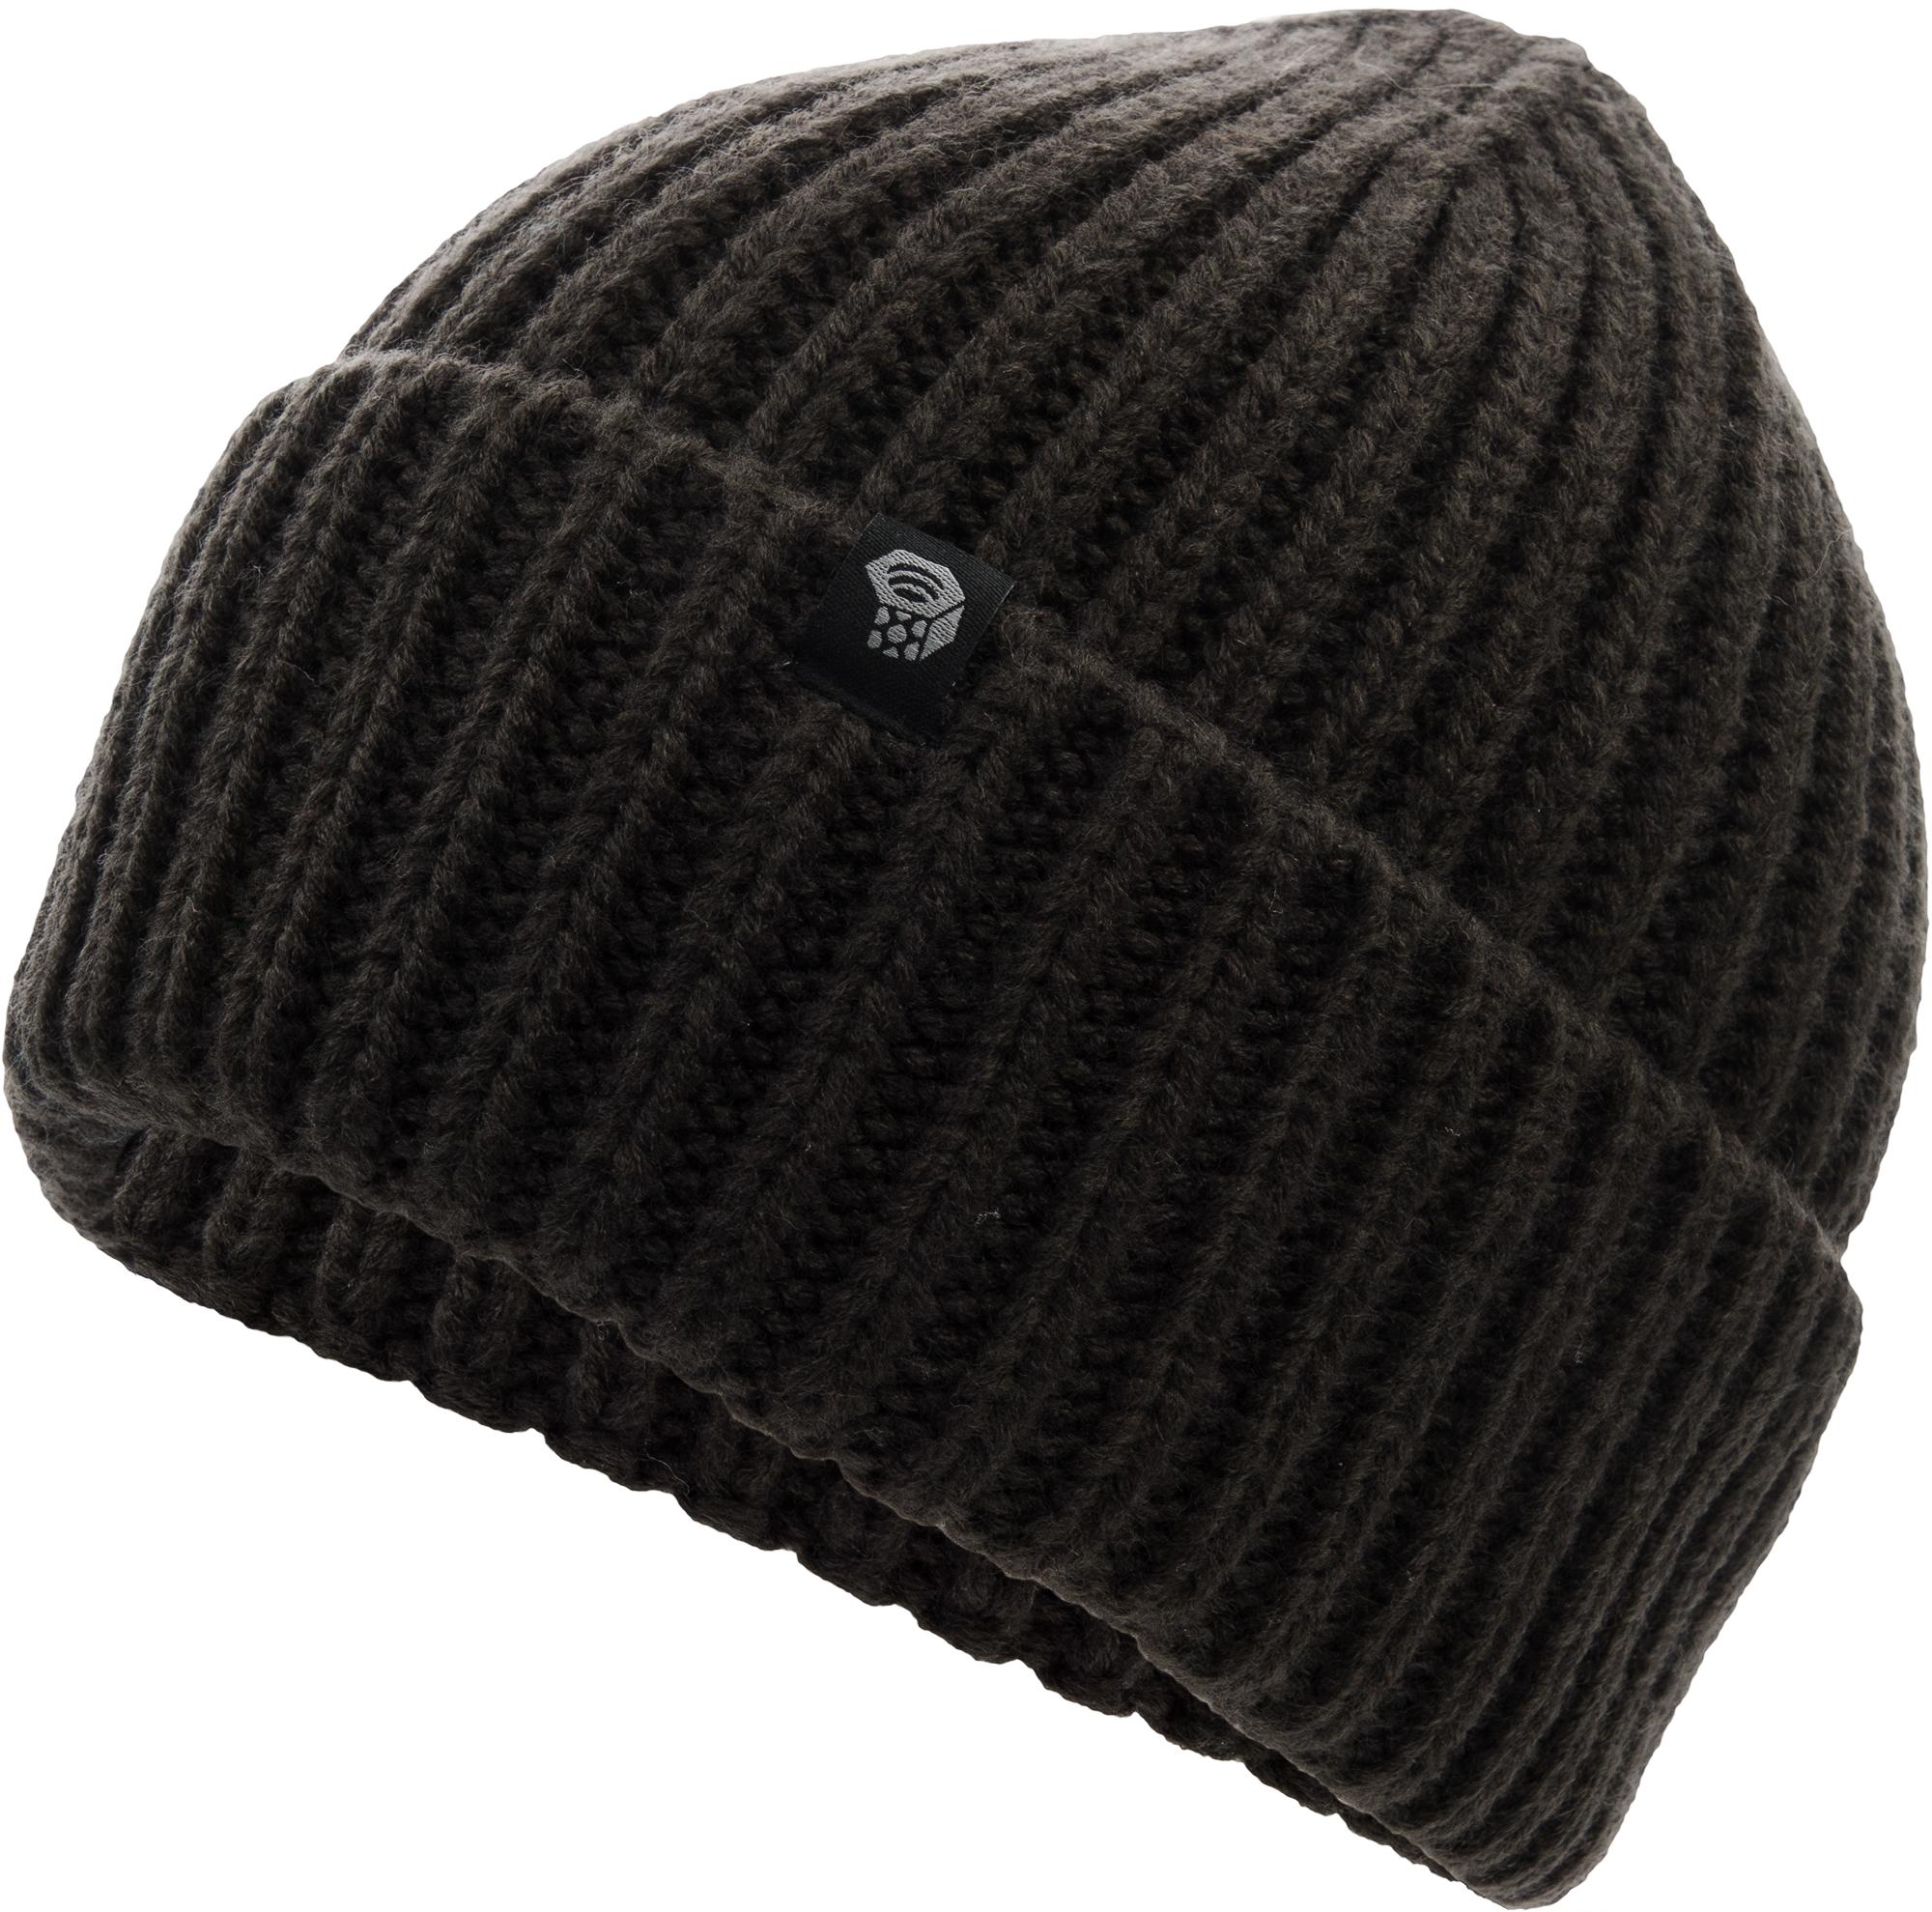 Mountain Hardwear Шапка женская Mountain Hardwear Slouchy Beanie шапка женская puma archive wm fold beanie цвет серый 02133402 размер универсальный